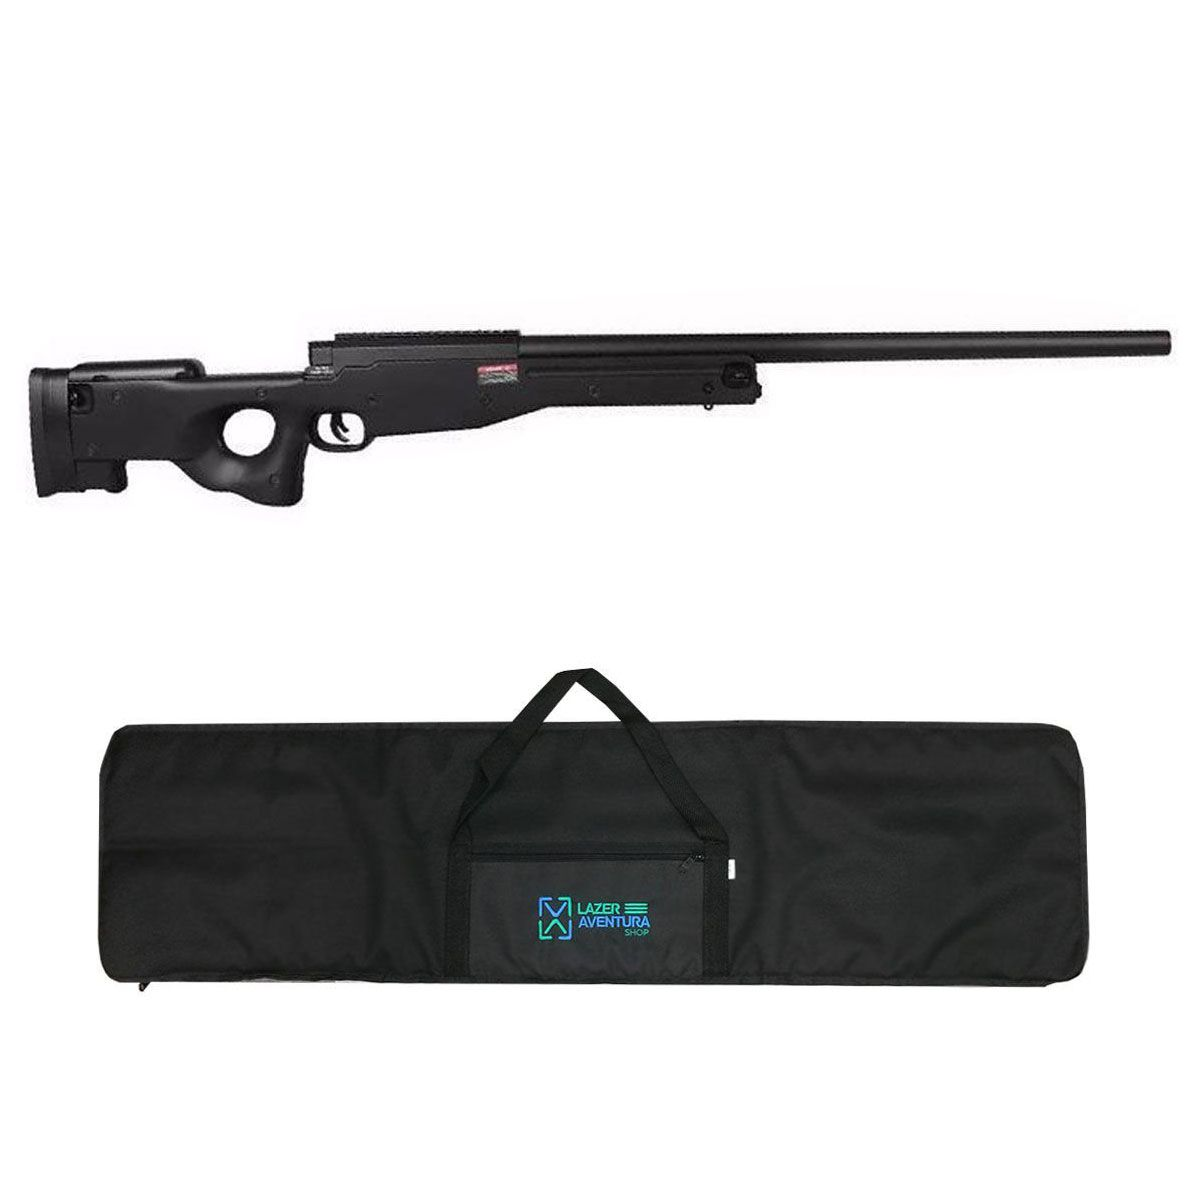 Kit Sniper Evo L96 Preto + Capa Lazer e Aventura